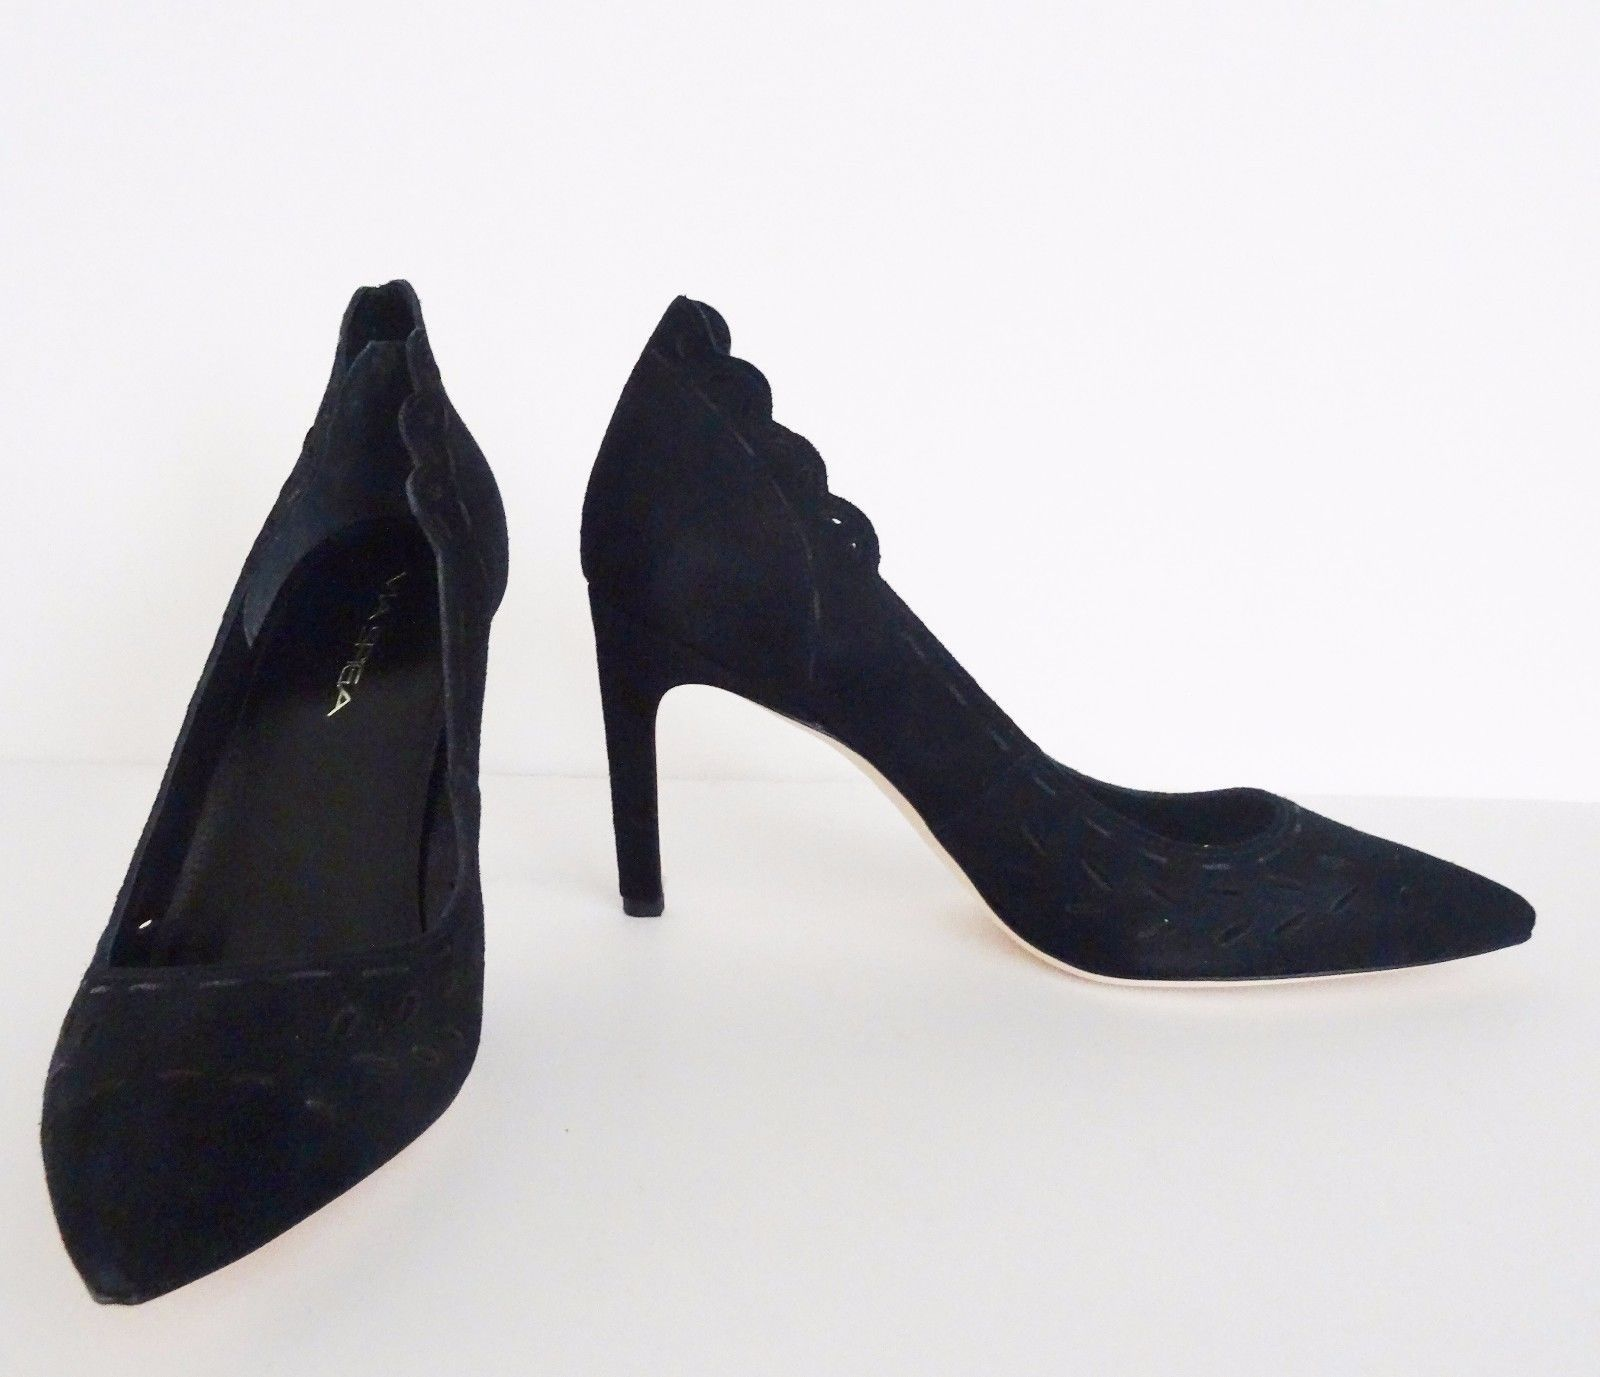 f8c725b07948 S l1600. S l1600. Previous. NIB Via Spiga Irisa Suede Womens Pointed Toe  Pumps Heels Size 7 M Black  225